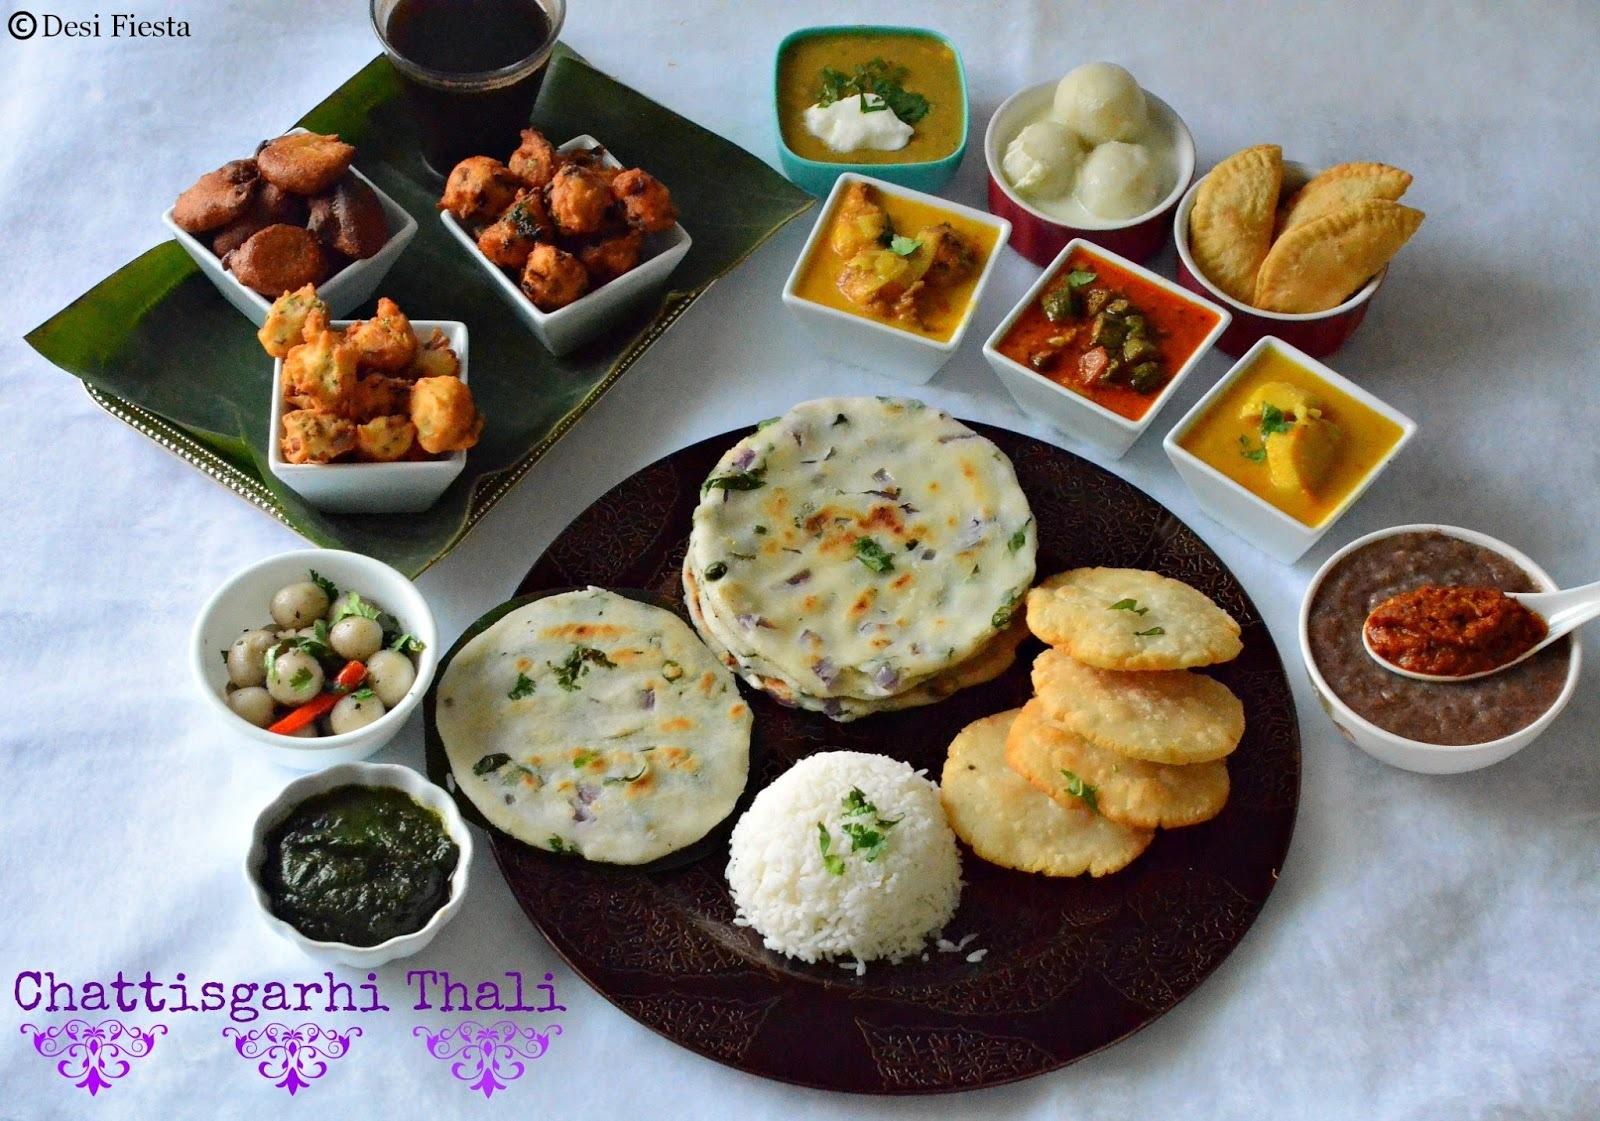 Chattisgarhi Thali | Chattisgarh Cuisine